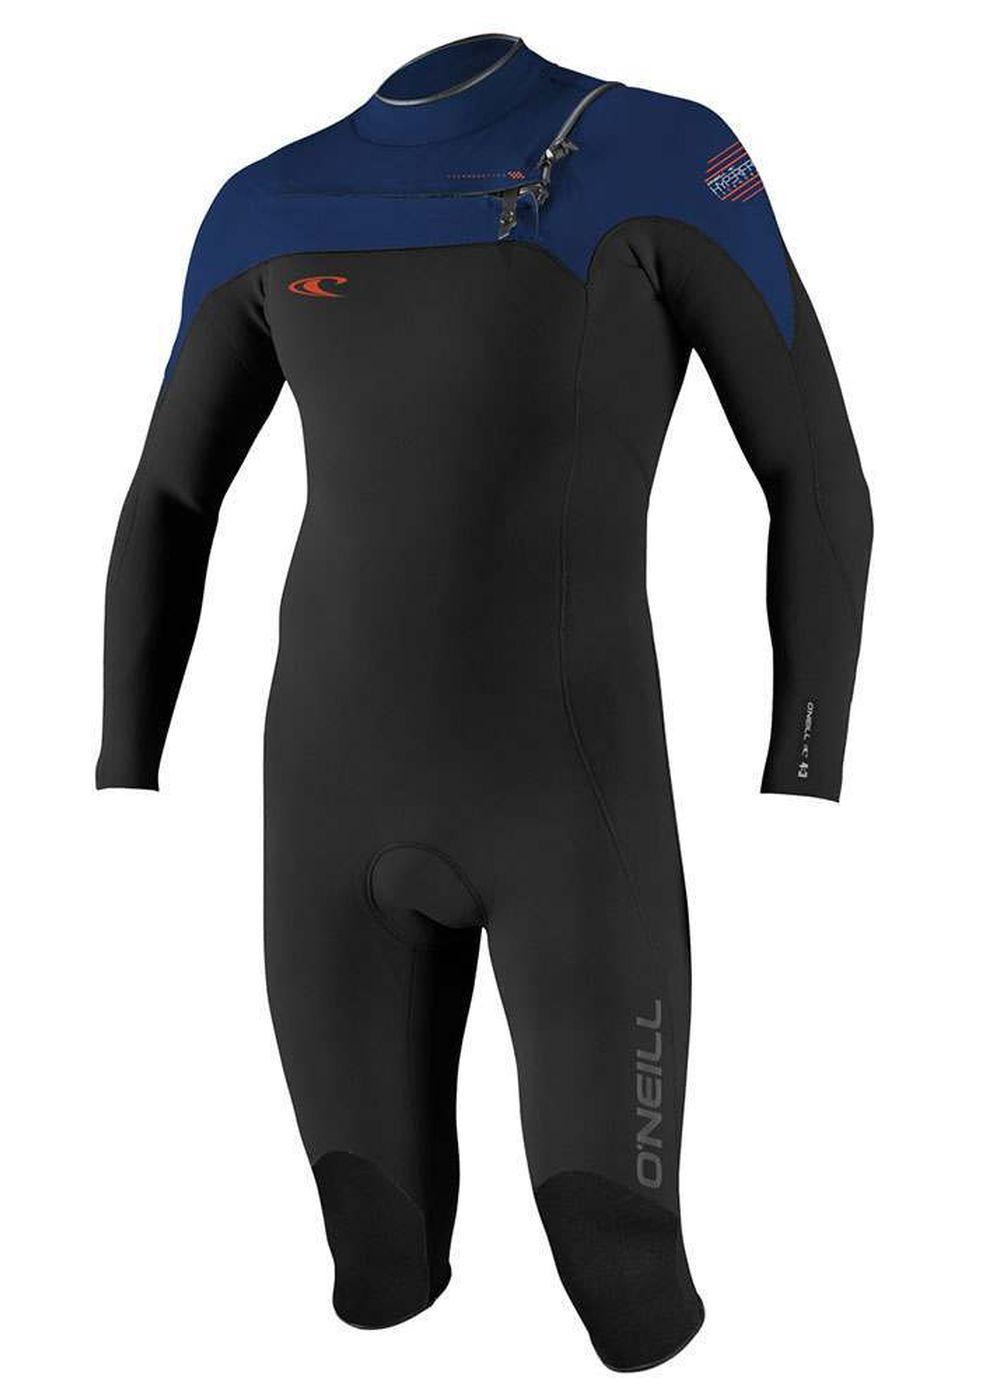 Oneill Hyperfreak 4/3 3q-length Wetsuit 2017 Blk Picture